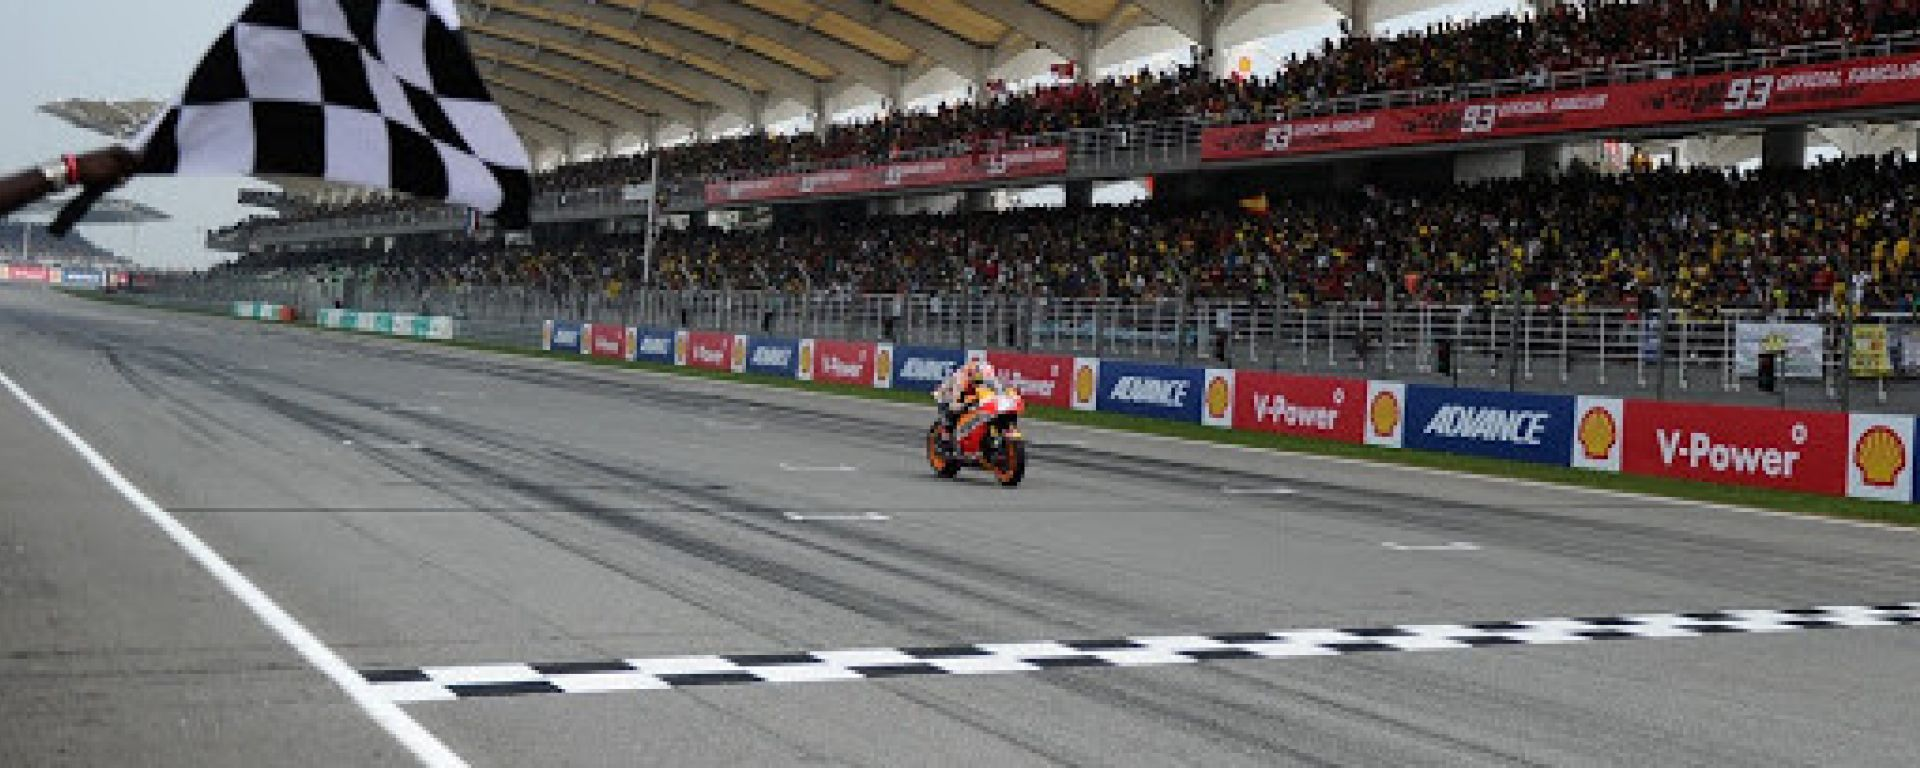 MotoGP Malesia 2015, Daniel Pedrosa (Honda)